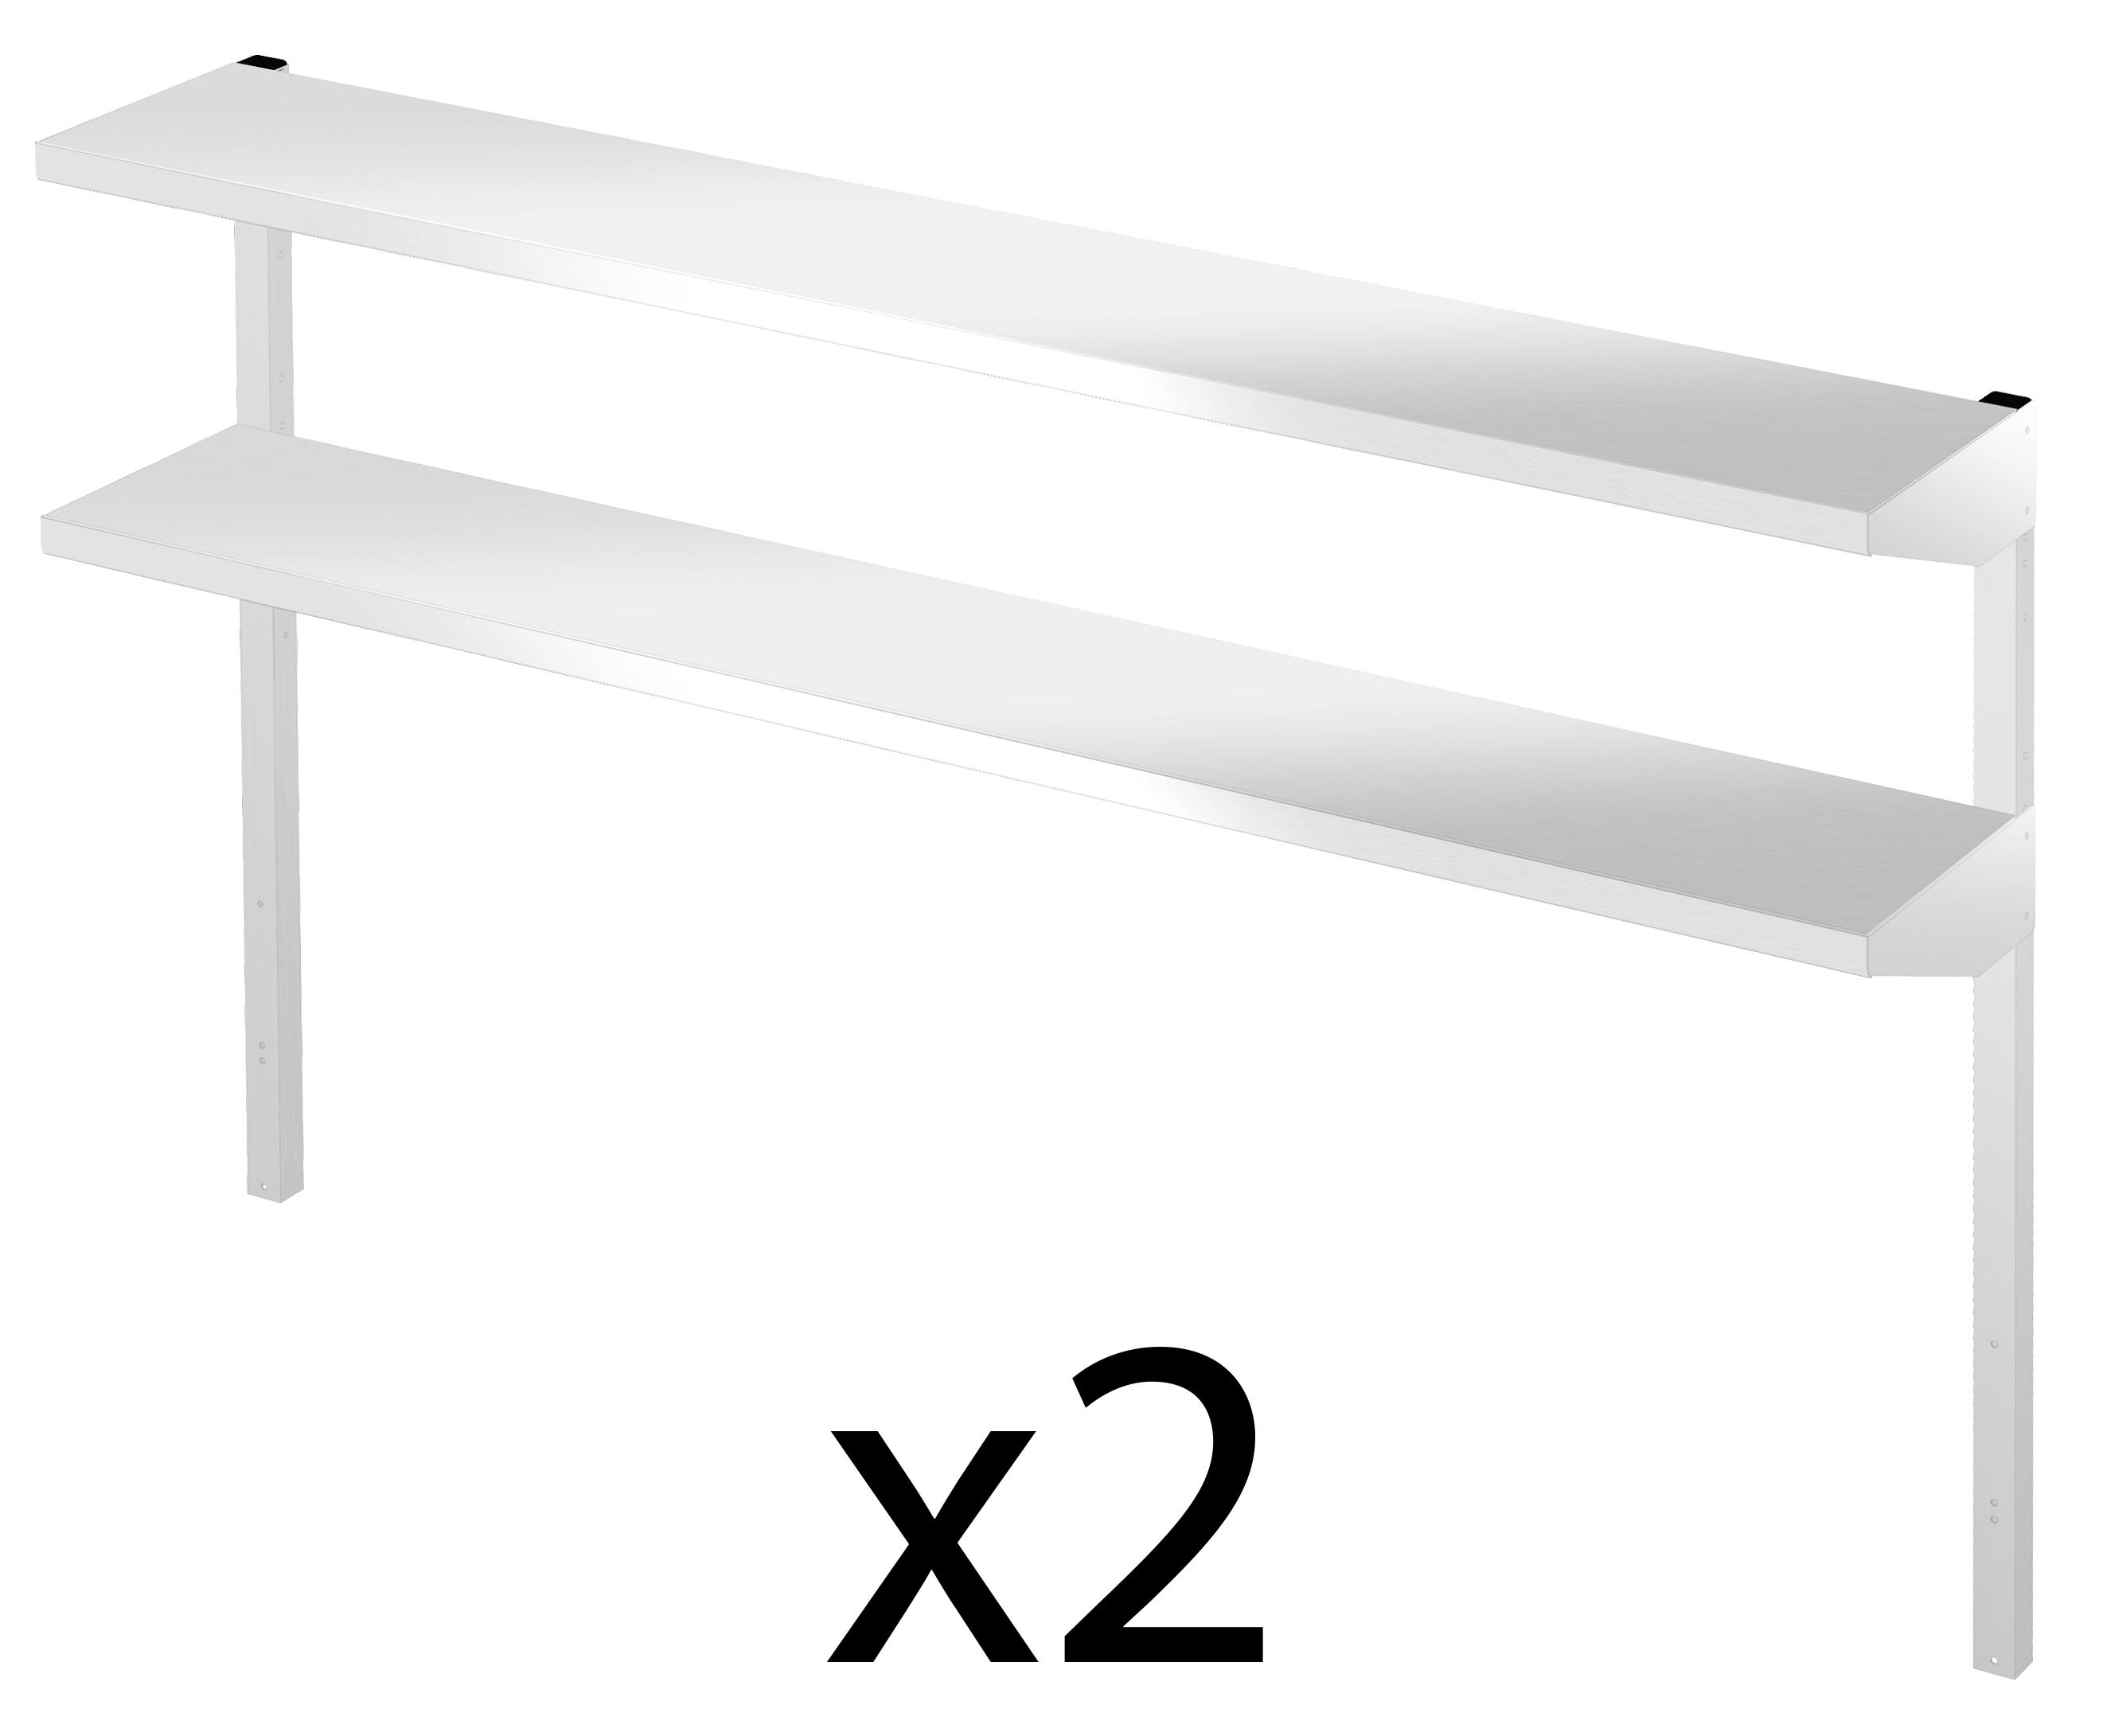 Hoshizaki HS-5228 (x2) shelving/shelving systems